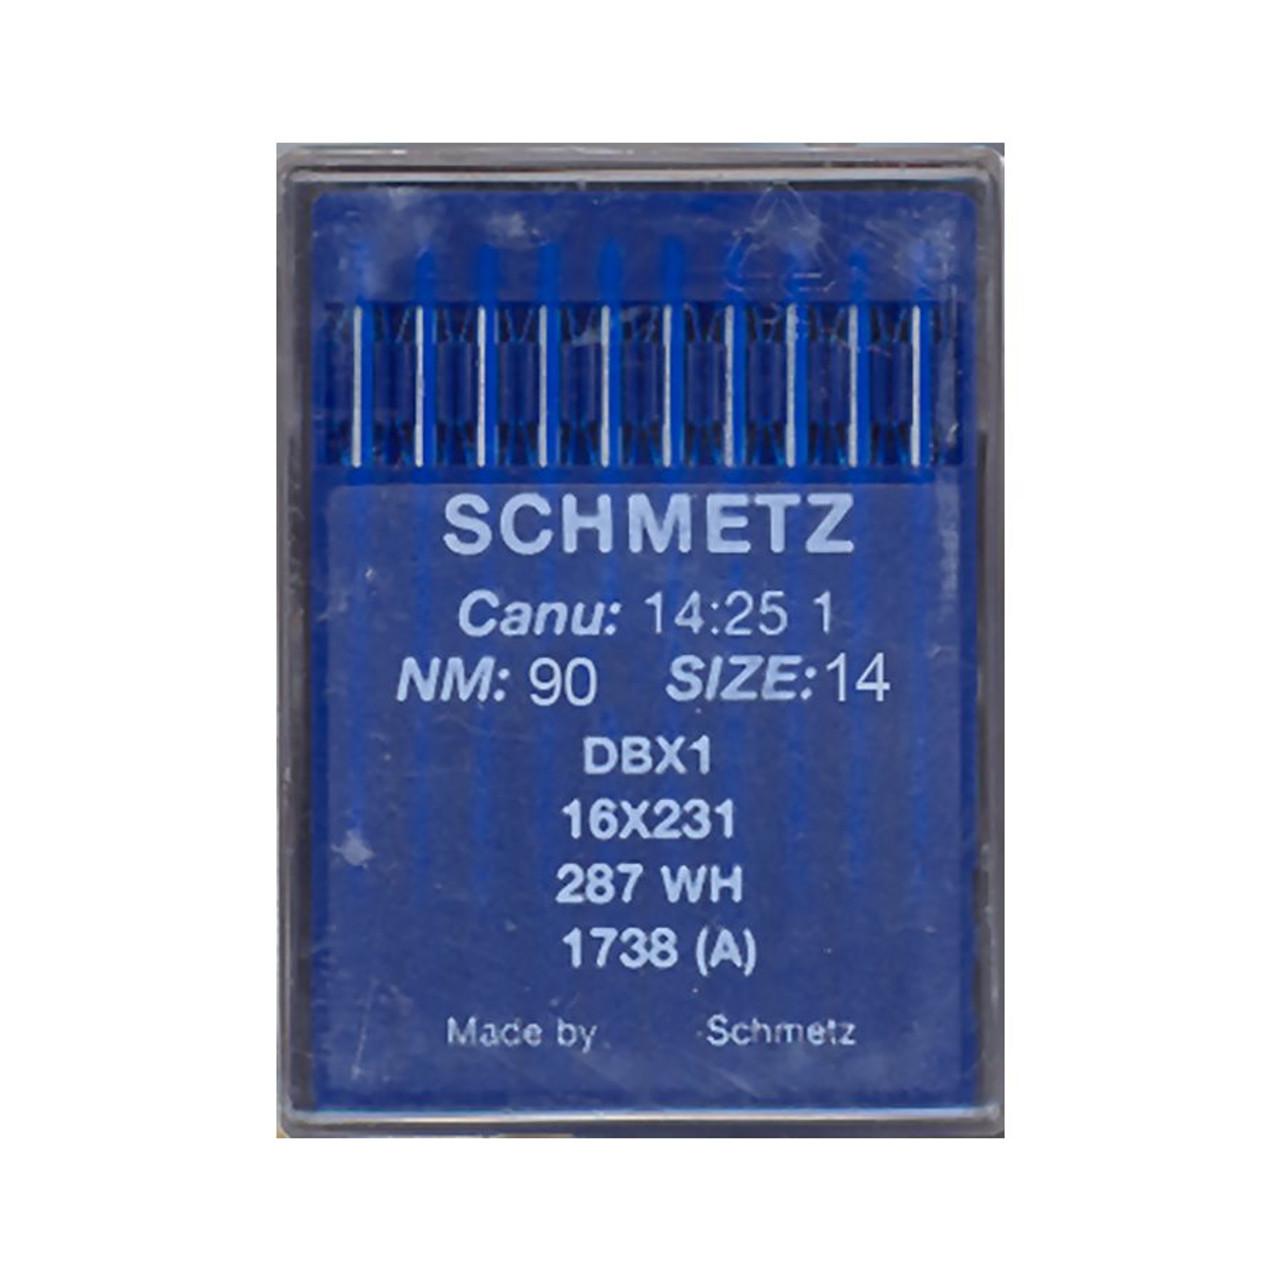 Schmetz Industrial Needles 16x231 SUK Ball Point